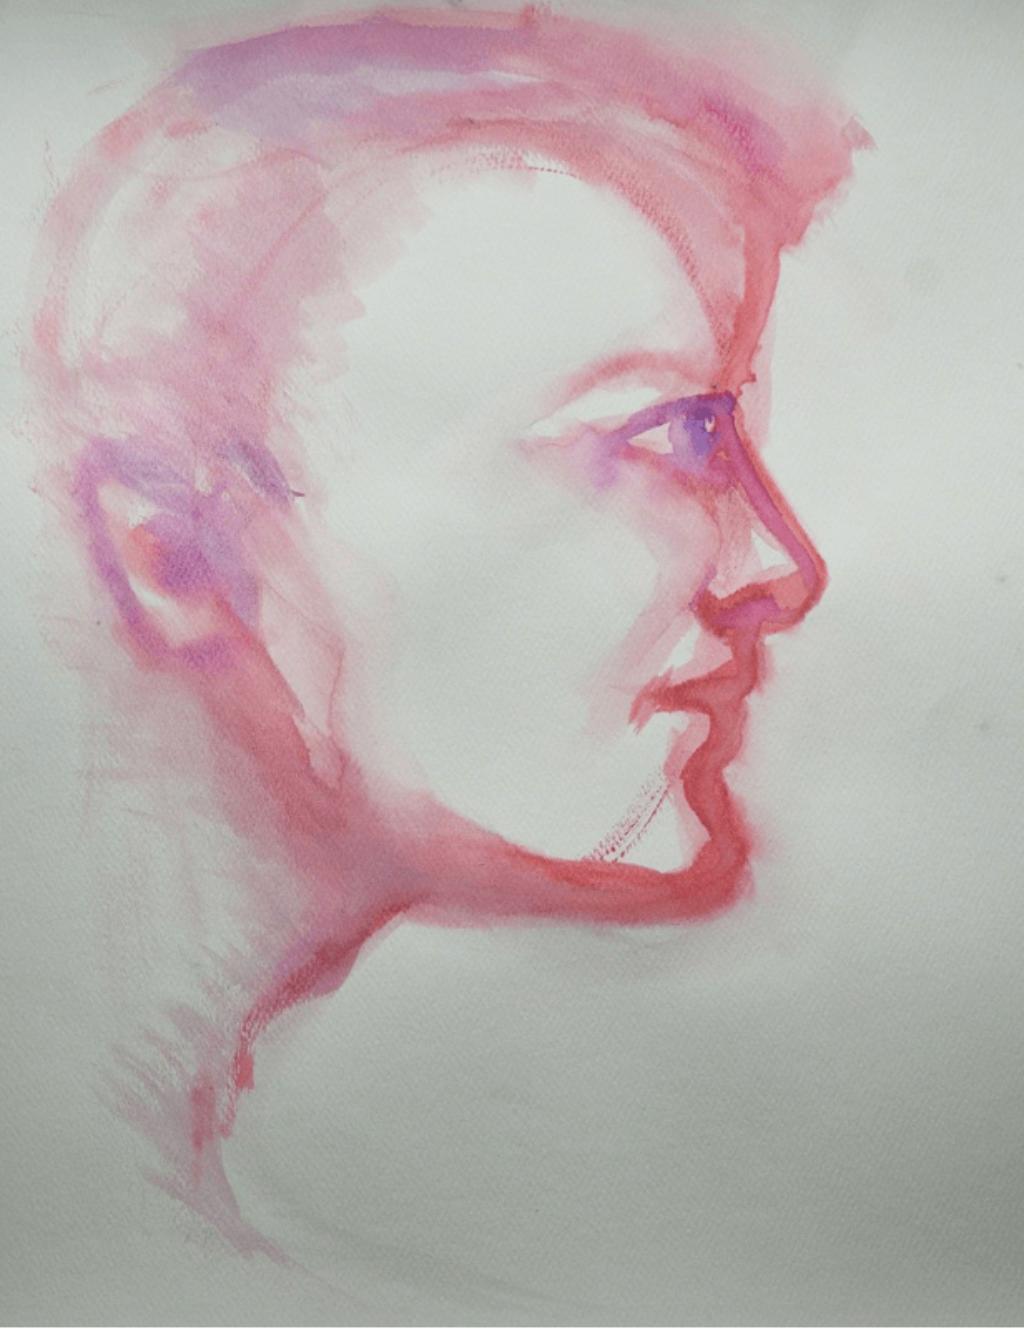 Alexandra Bregman MvVO Art